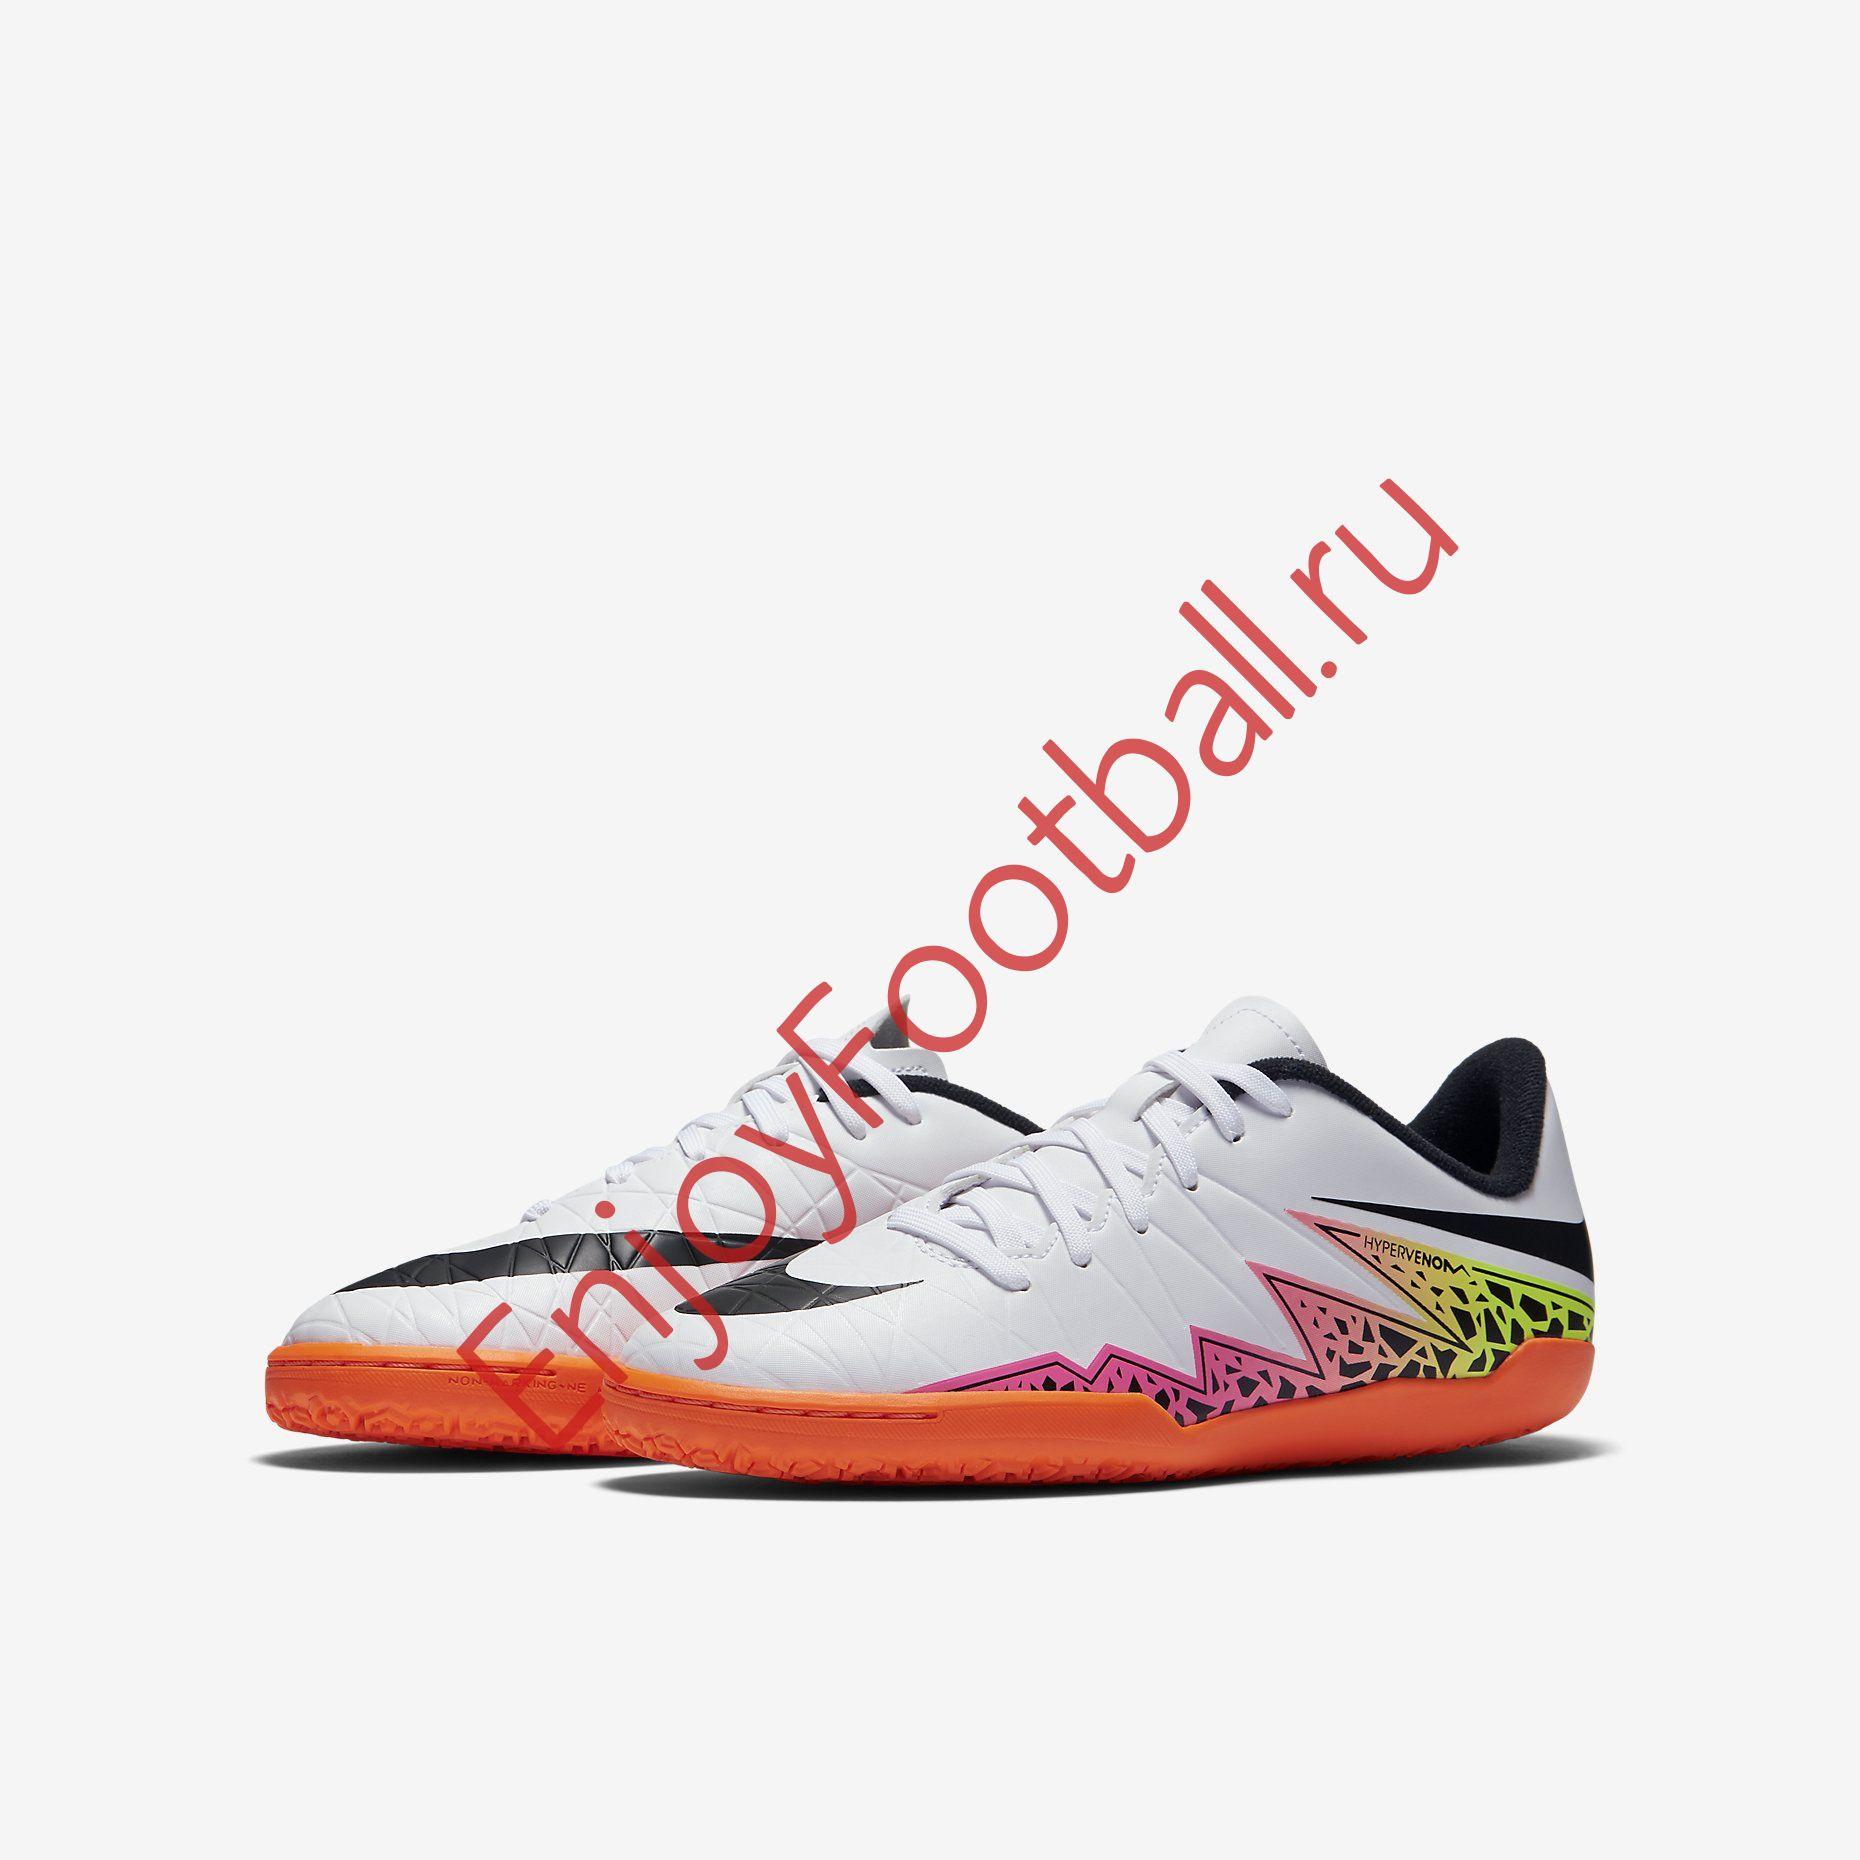 quality design 1e052 29c0f Детская обувь для зала NIKE HYPERVENOM PHELON II IC 749920-108 JR